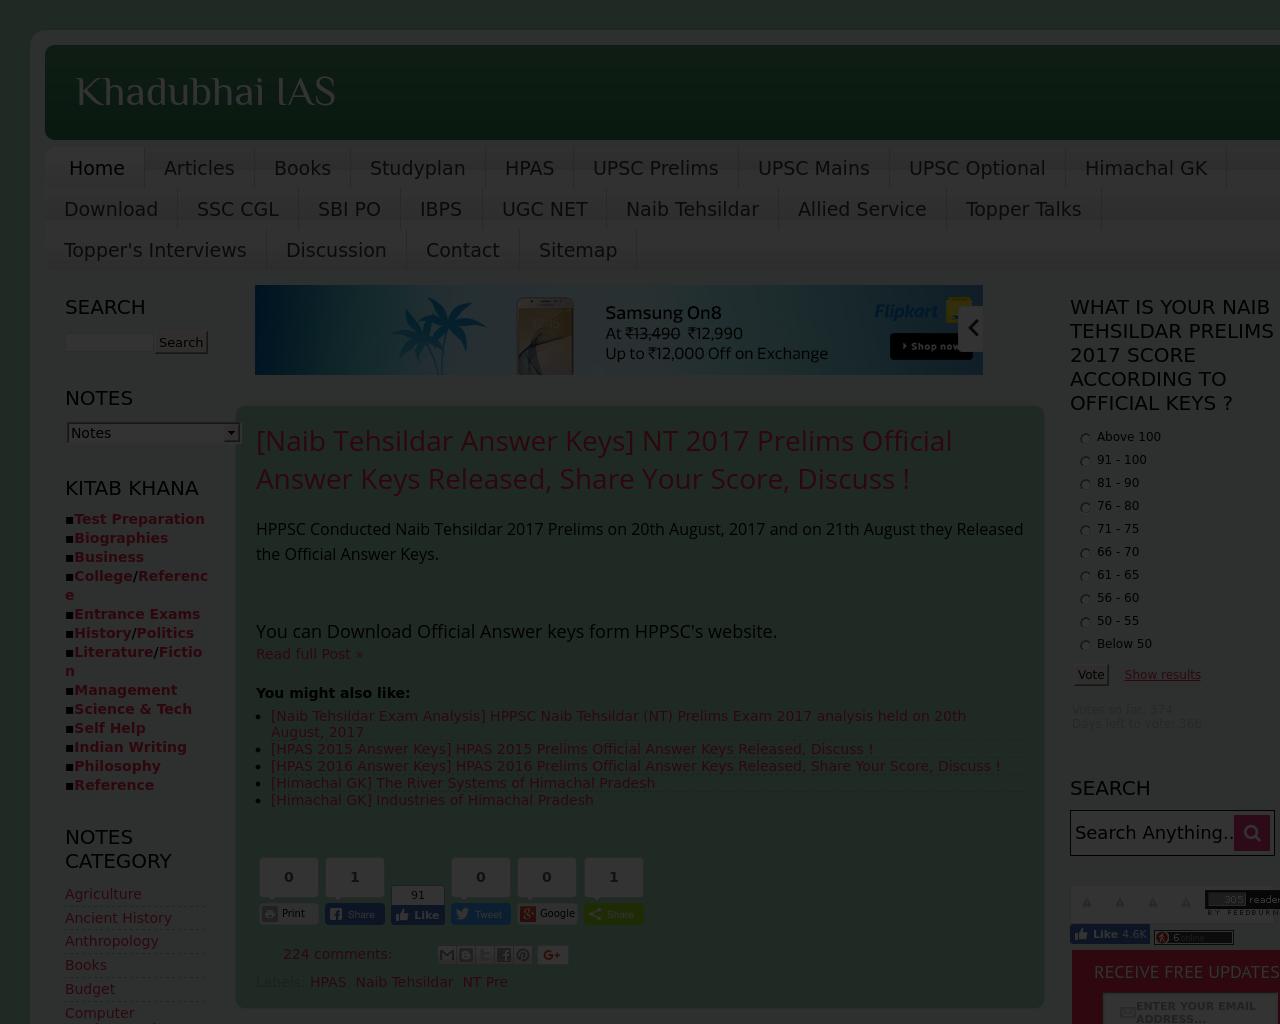 Khadubhai-IAS-Advertising-Reviews-Pricing